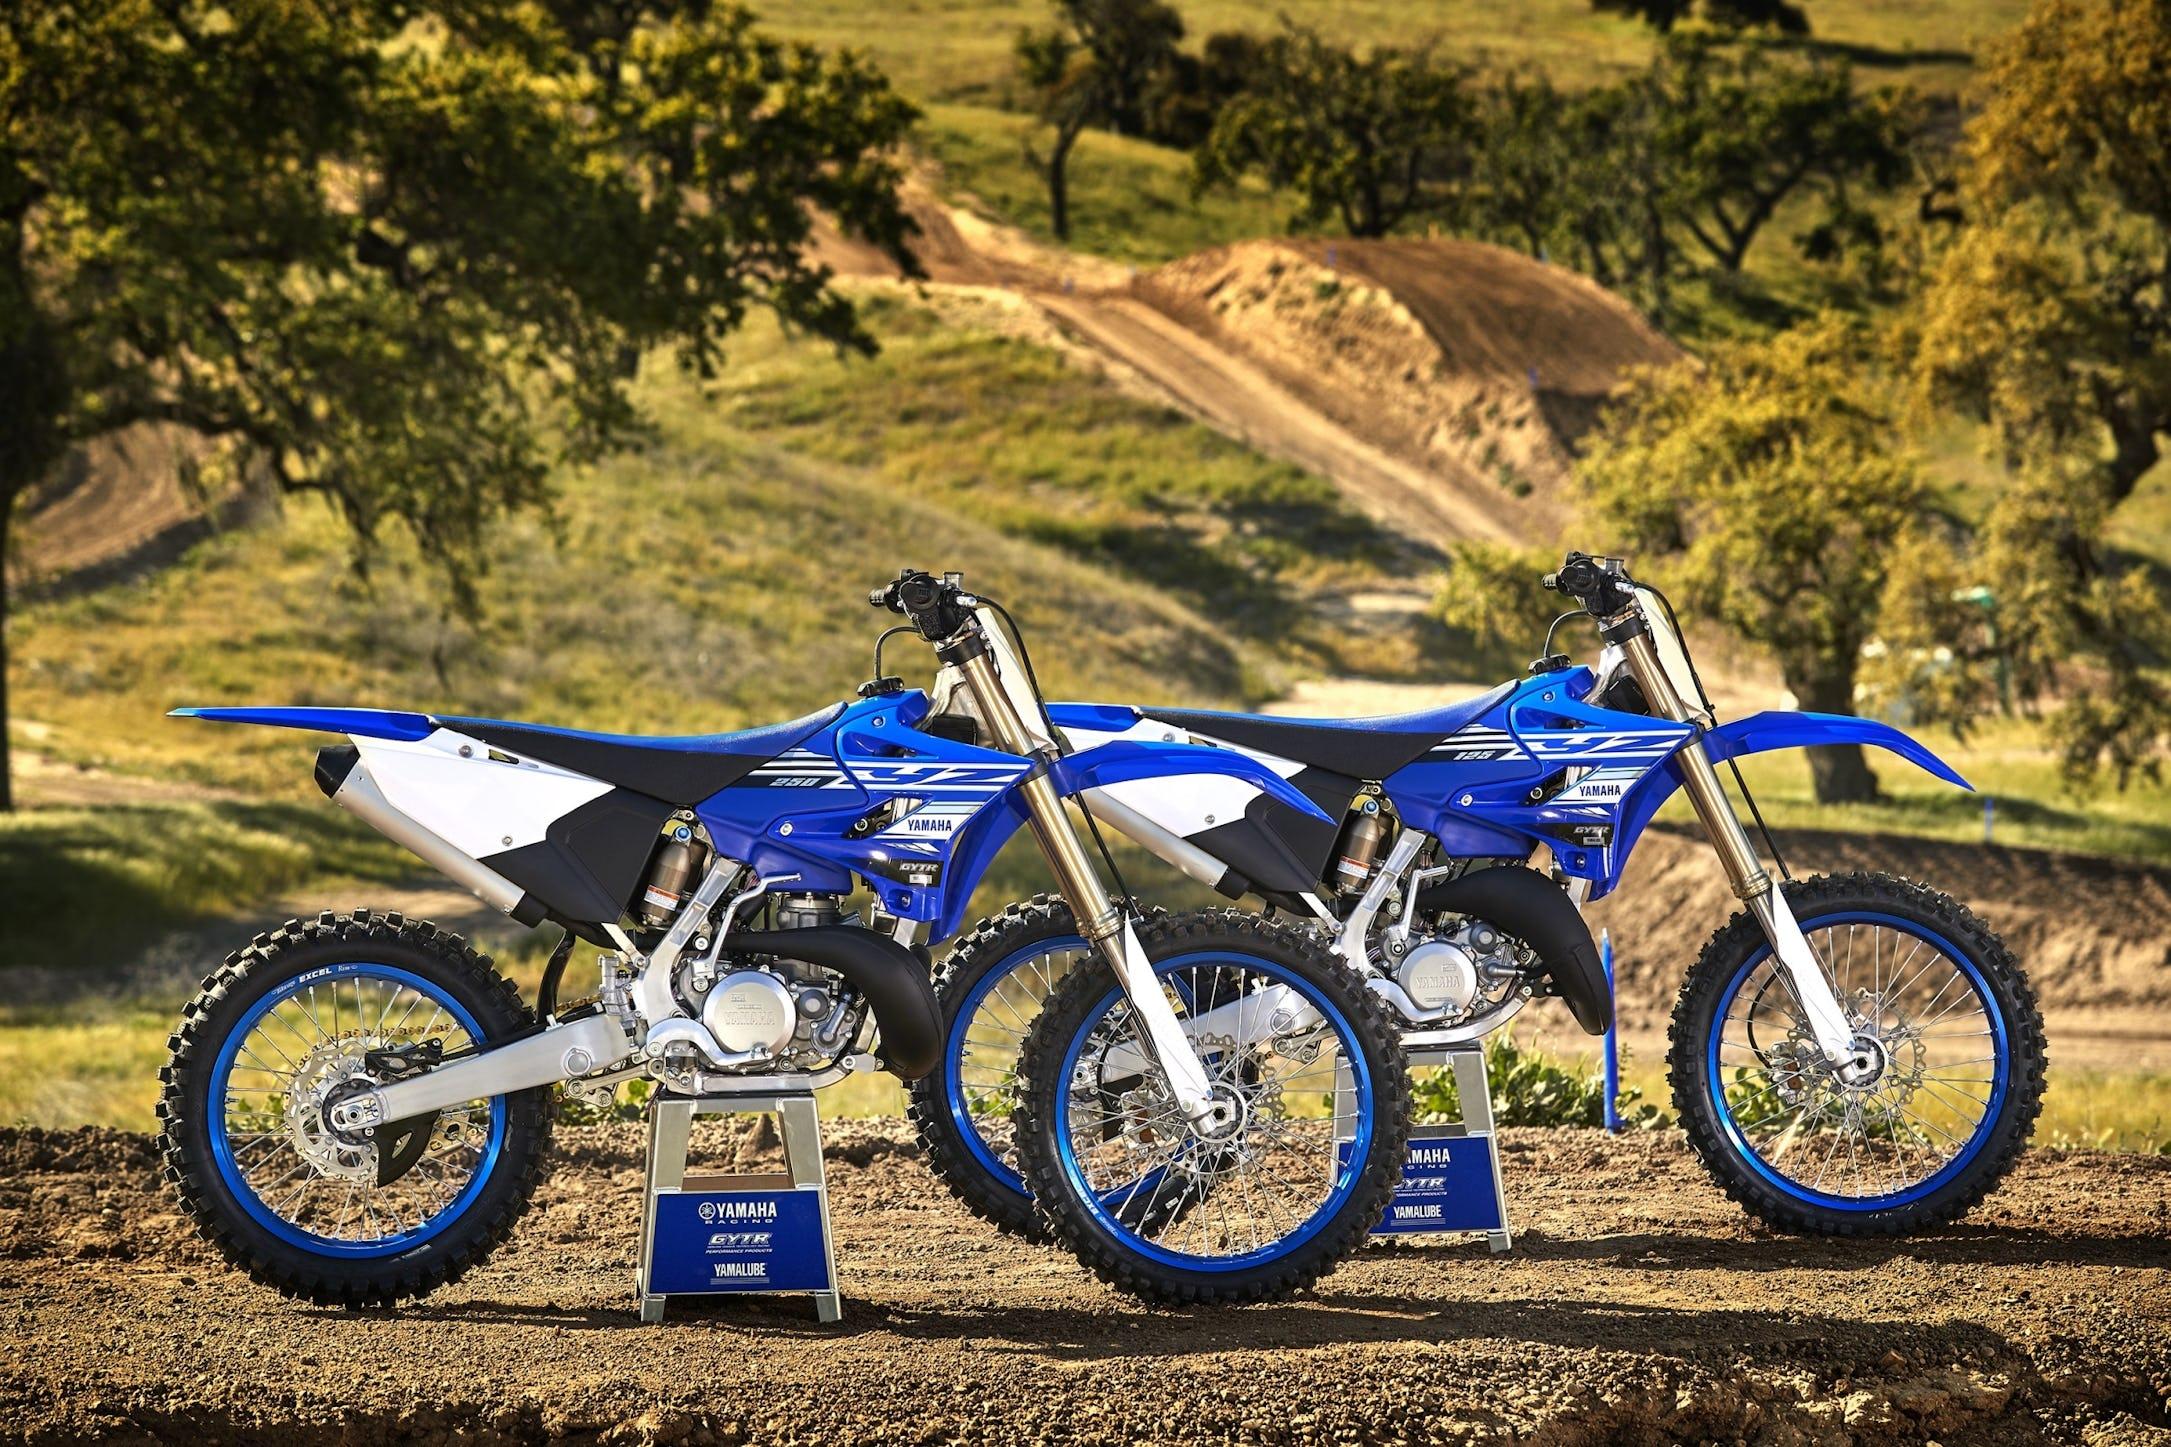 Yamaha Unveils Two-Stroke Motocross Models for 2019 - Racer